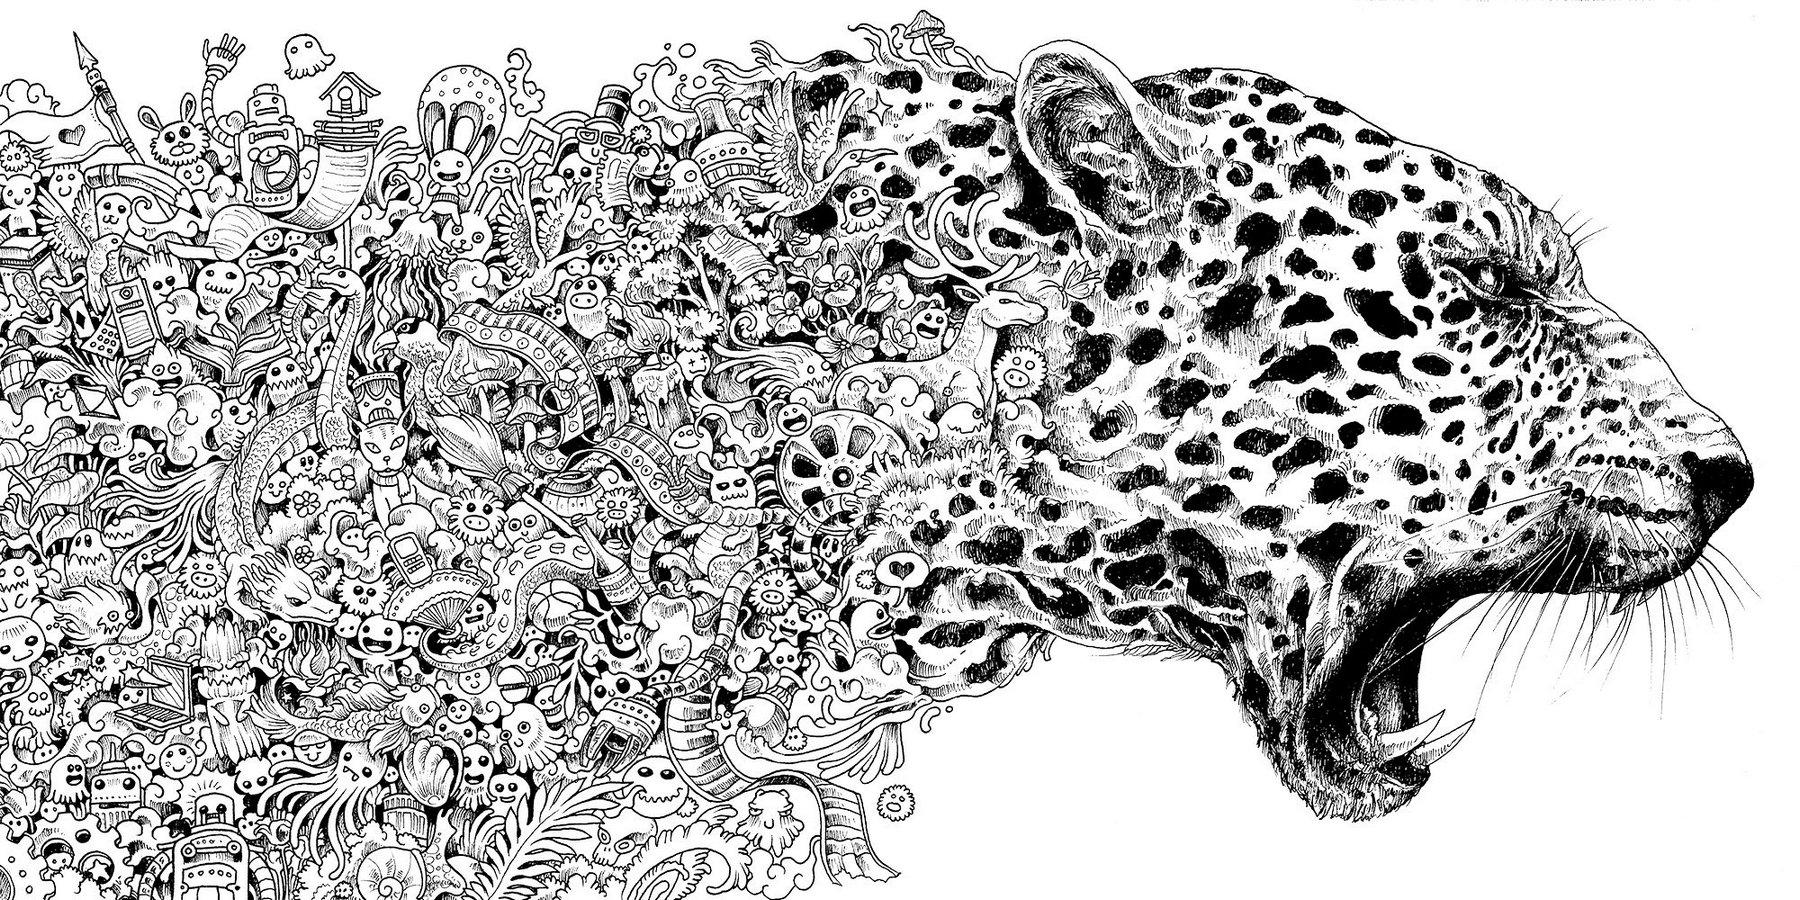 Mythomorphia-tiger-coloring-book